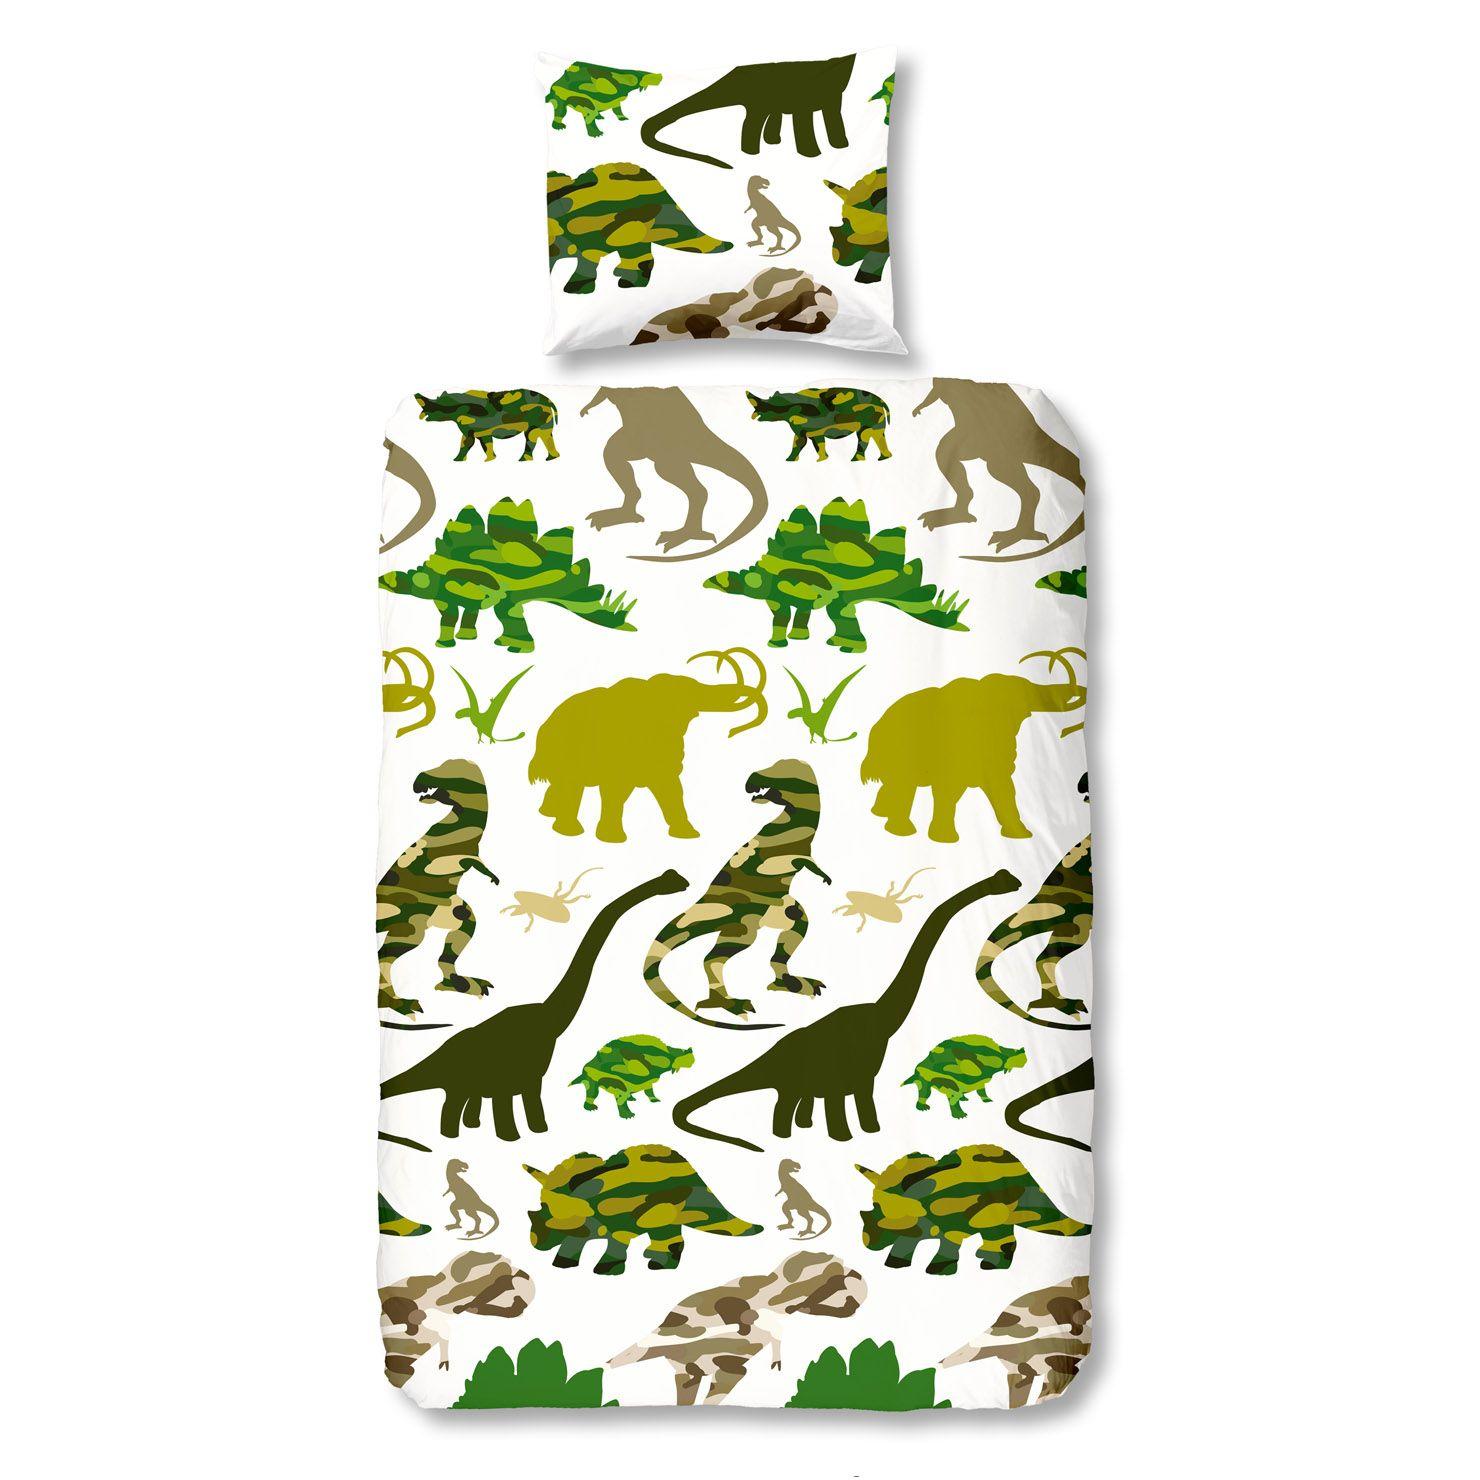 Dinosaur Single Duvet Cover And Pillowcase For The